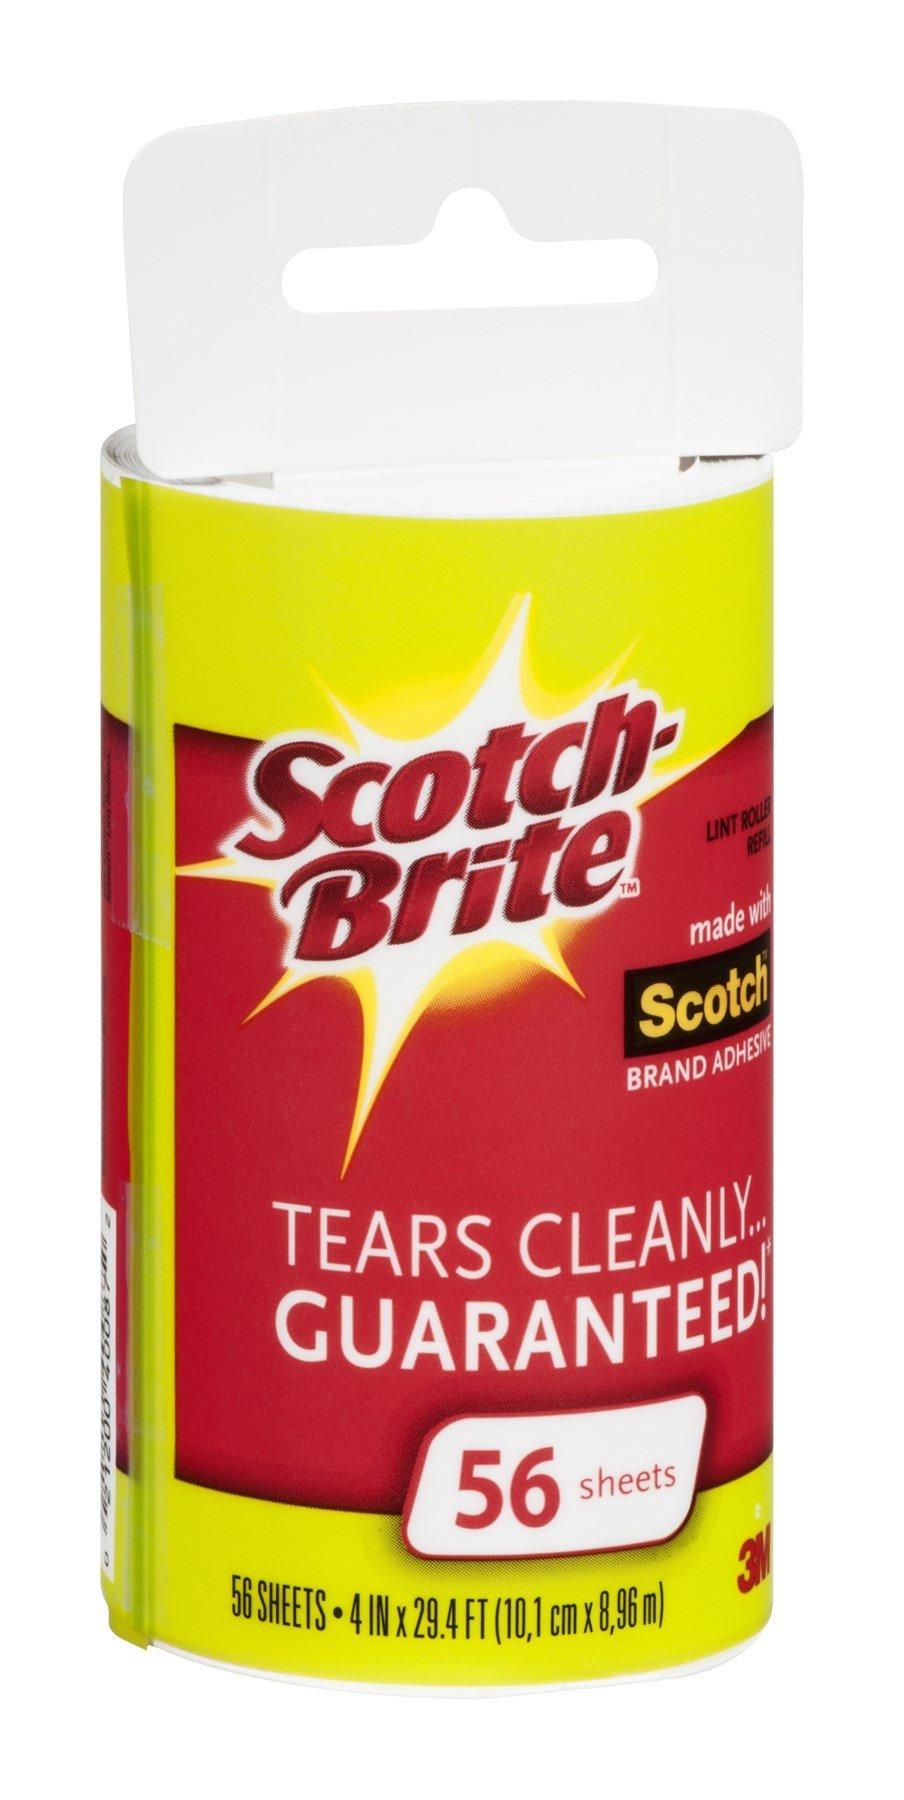 Scotch-Brite Lint Roller Refill by 3M